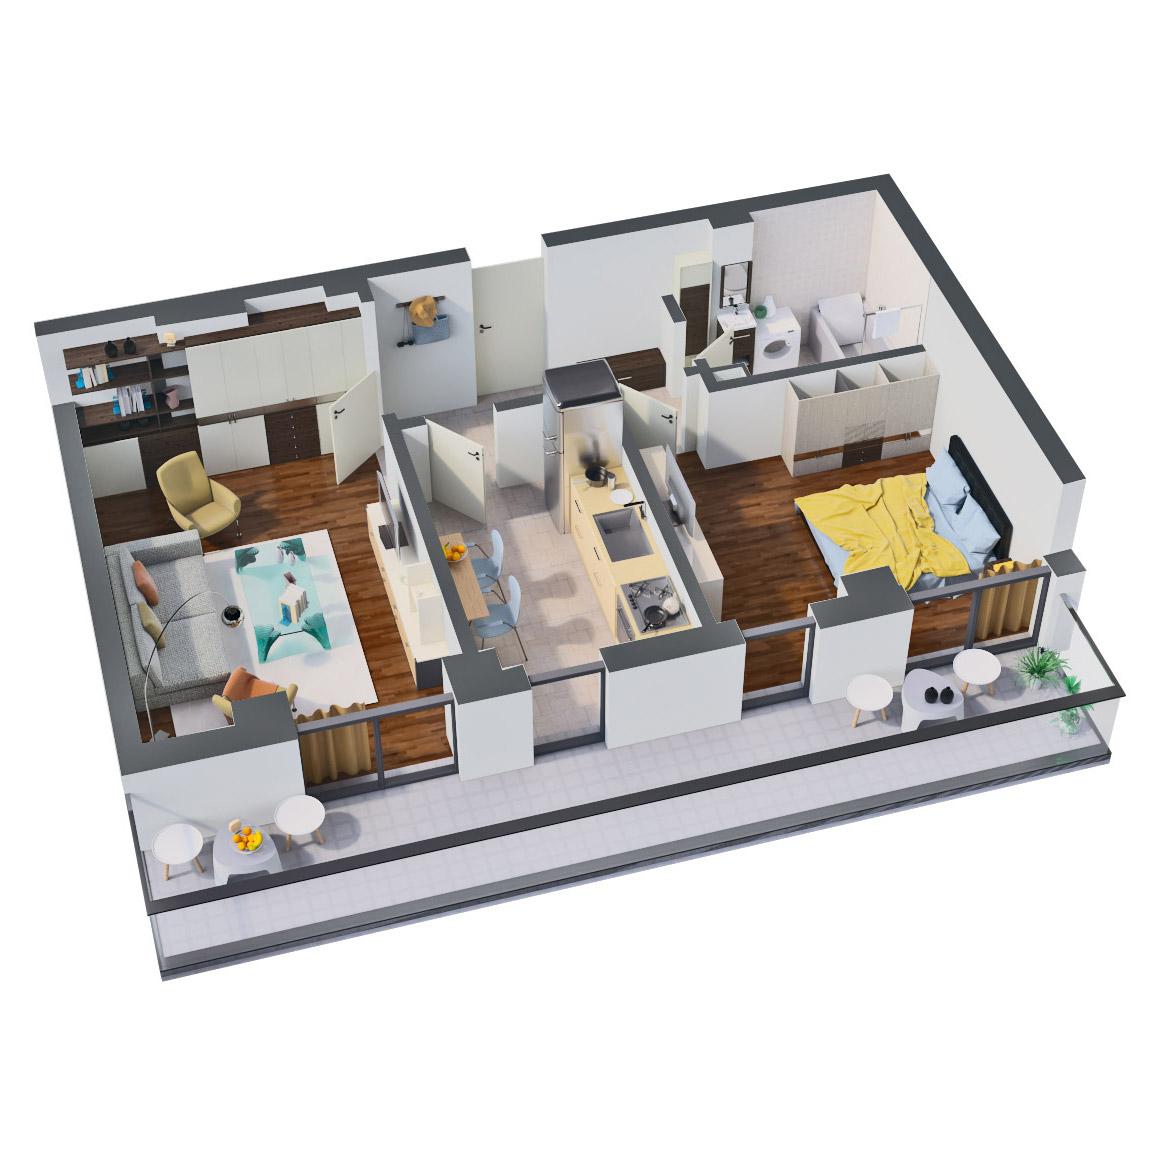 Apartament 2 camere de vanzare Bucuresti - Catedral Residence - Marriott, Piata Unirii, 13 Septembrie, Izvor - Tip 2 - T2A - B